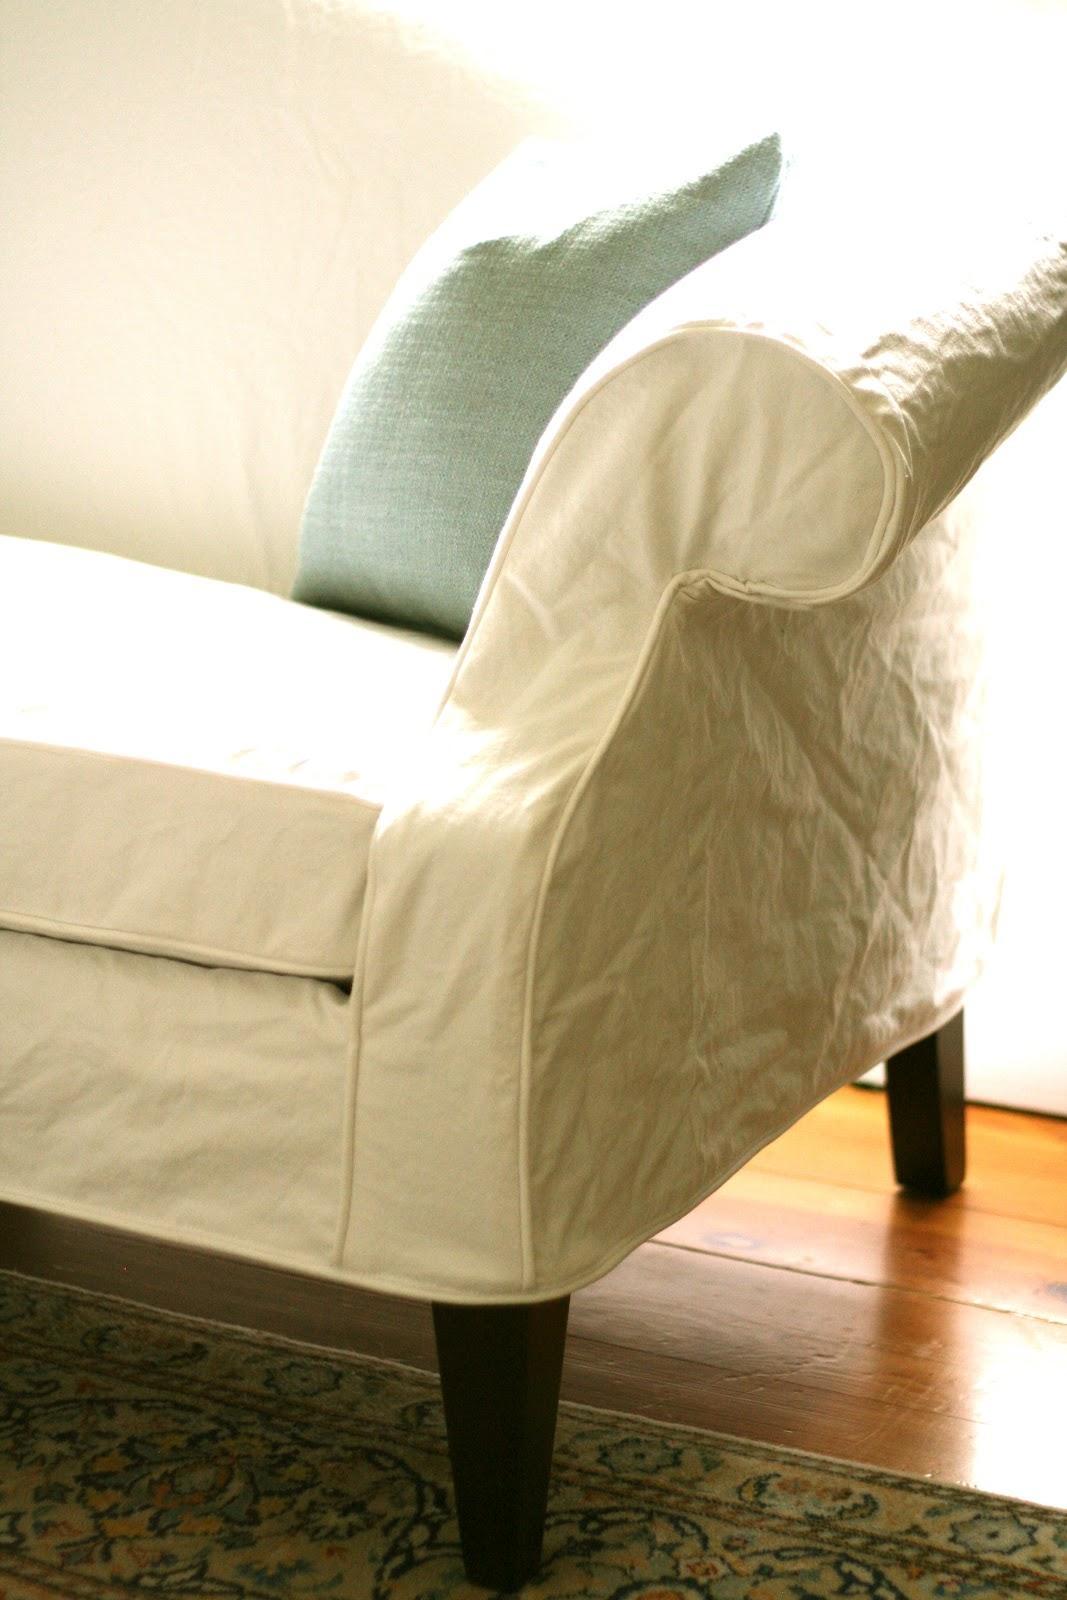 Custom Slipcoversshelley: White Camel Back Couch Regarding Camelback Slipcovers (Image 7 of 20)